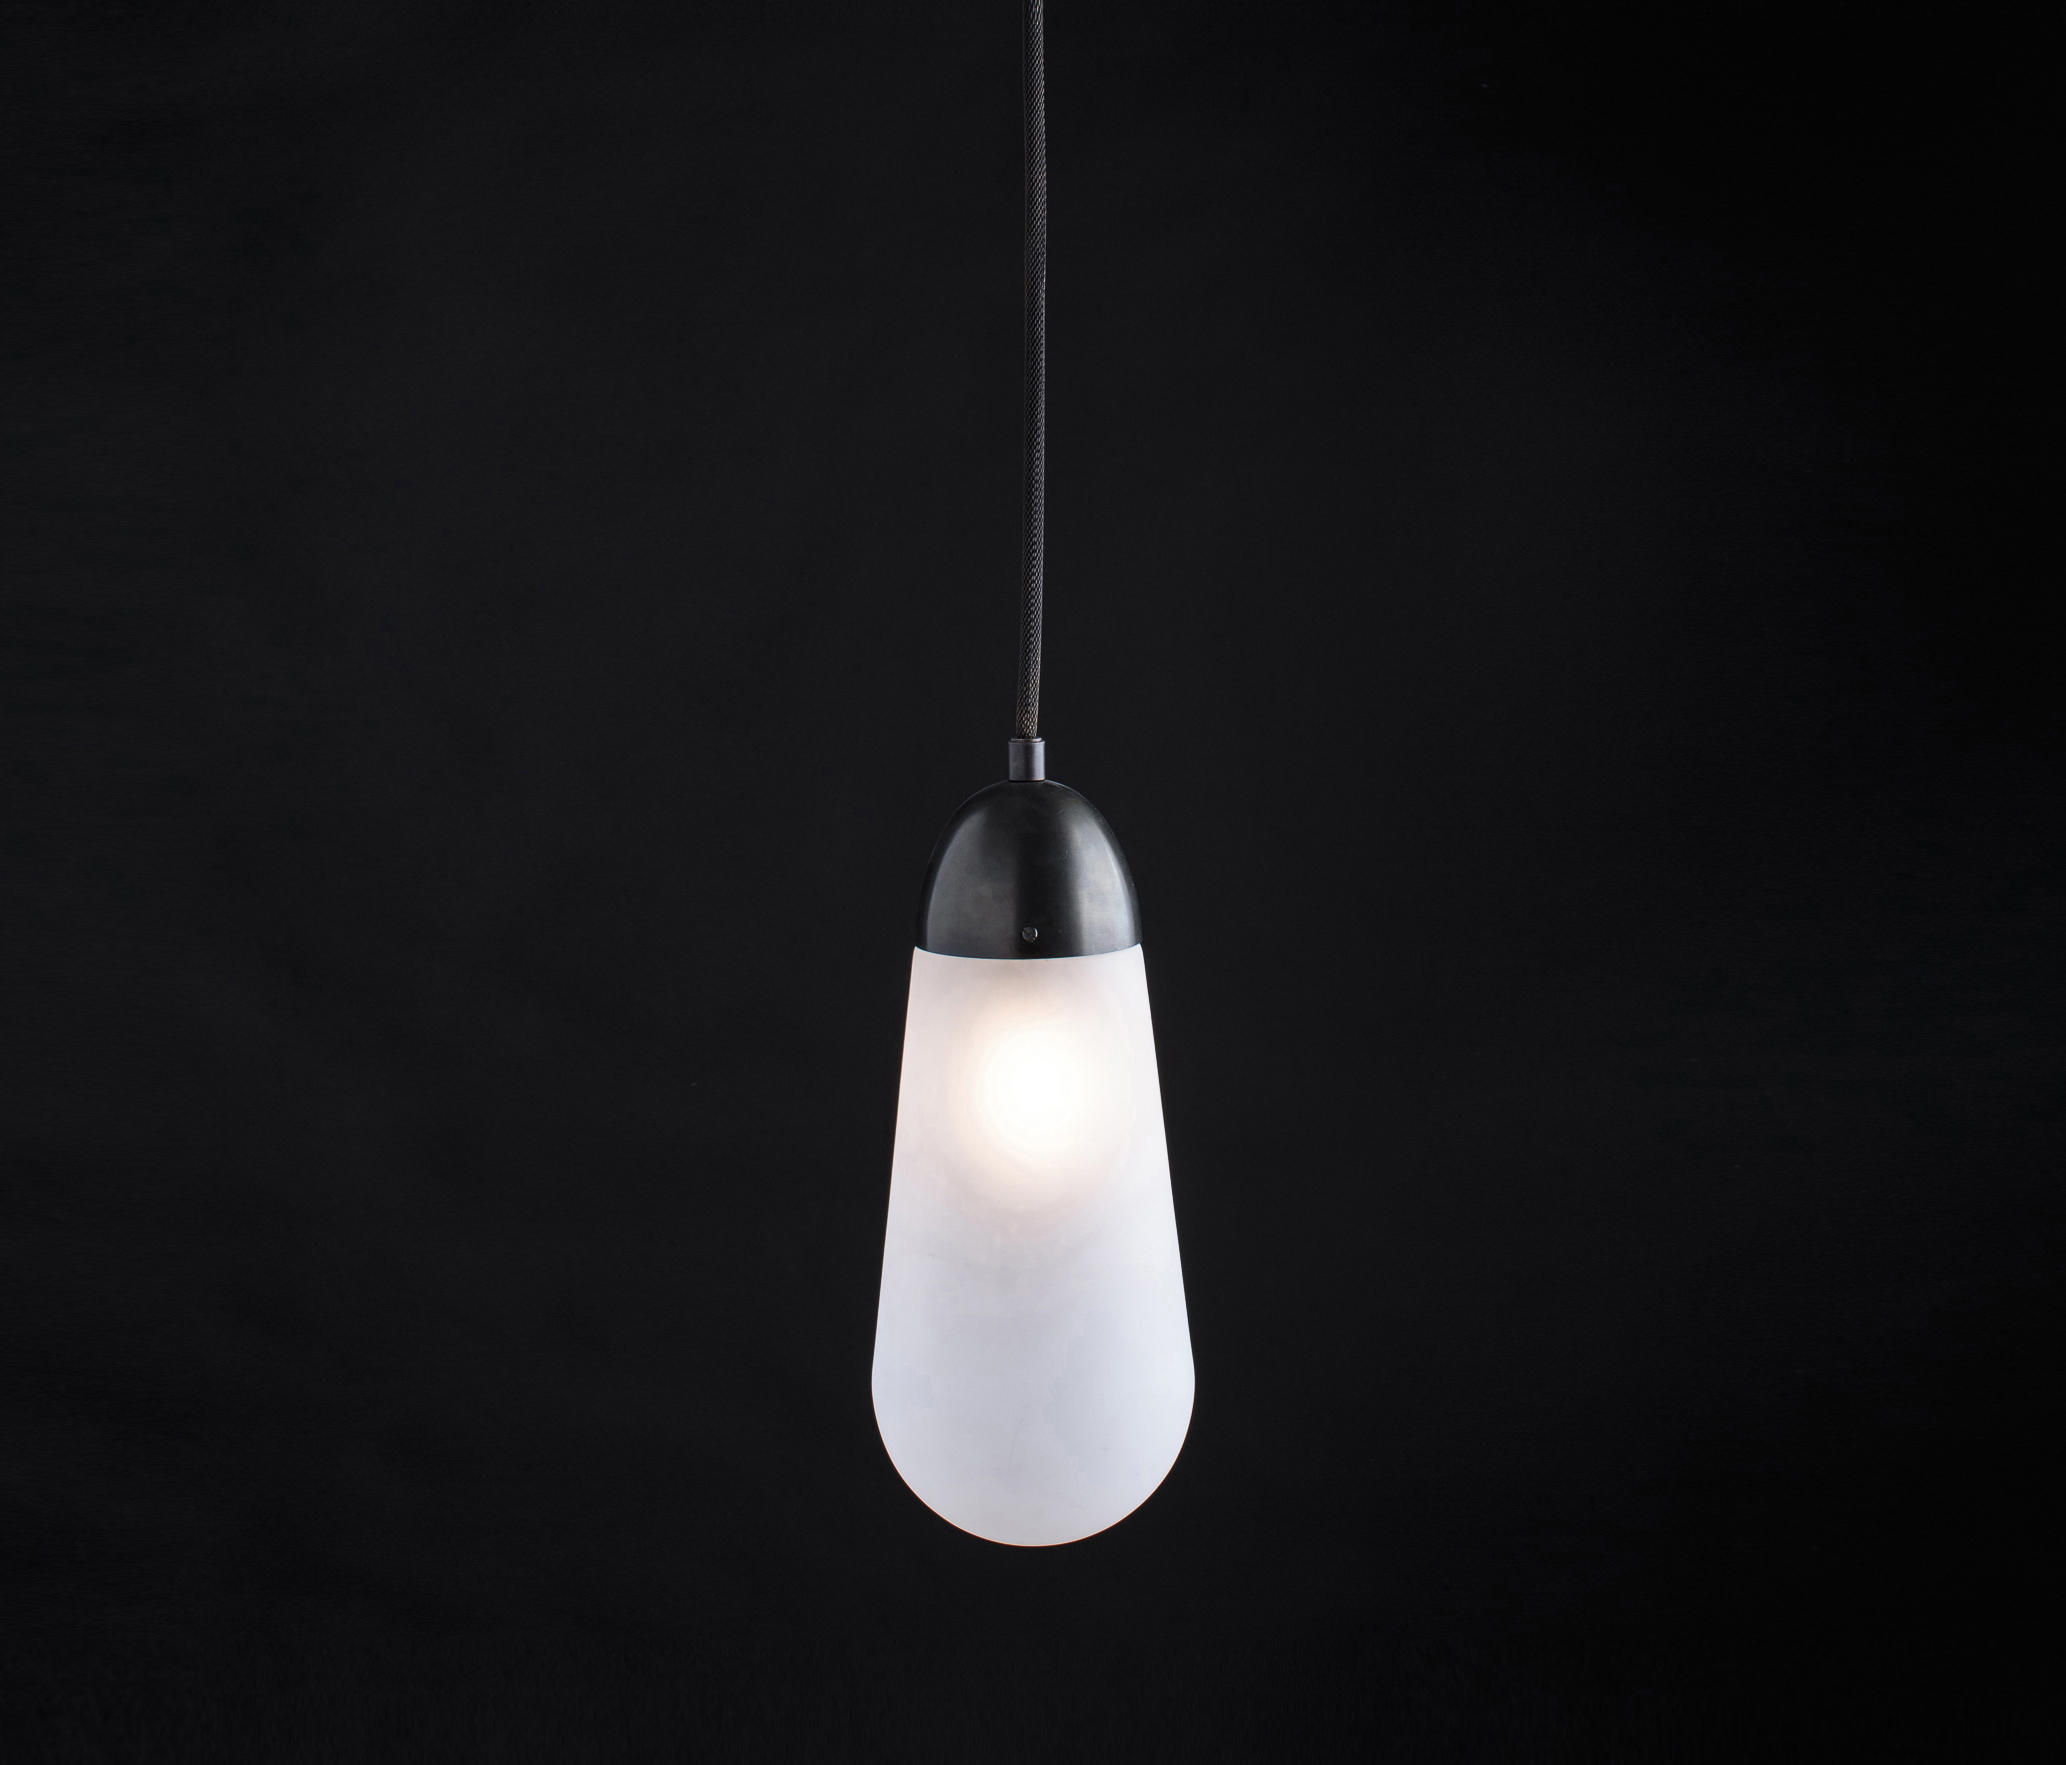 apparatus lighting. lariat 1 by apparatus general lighting